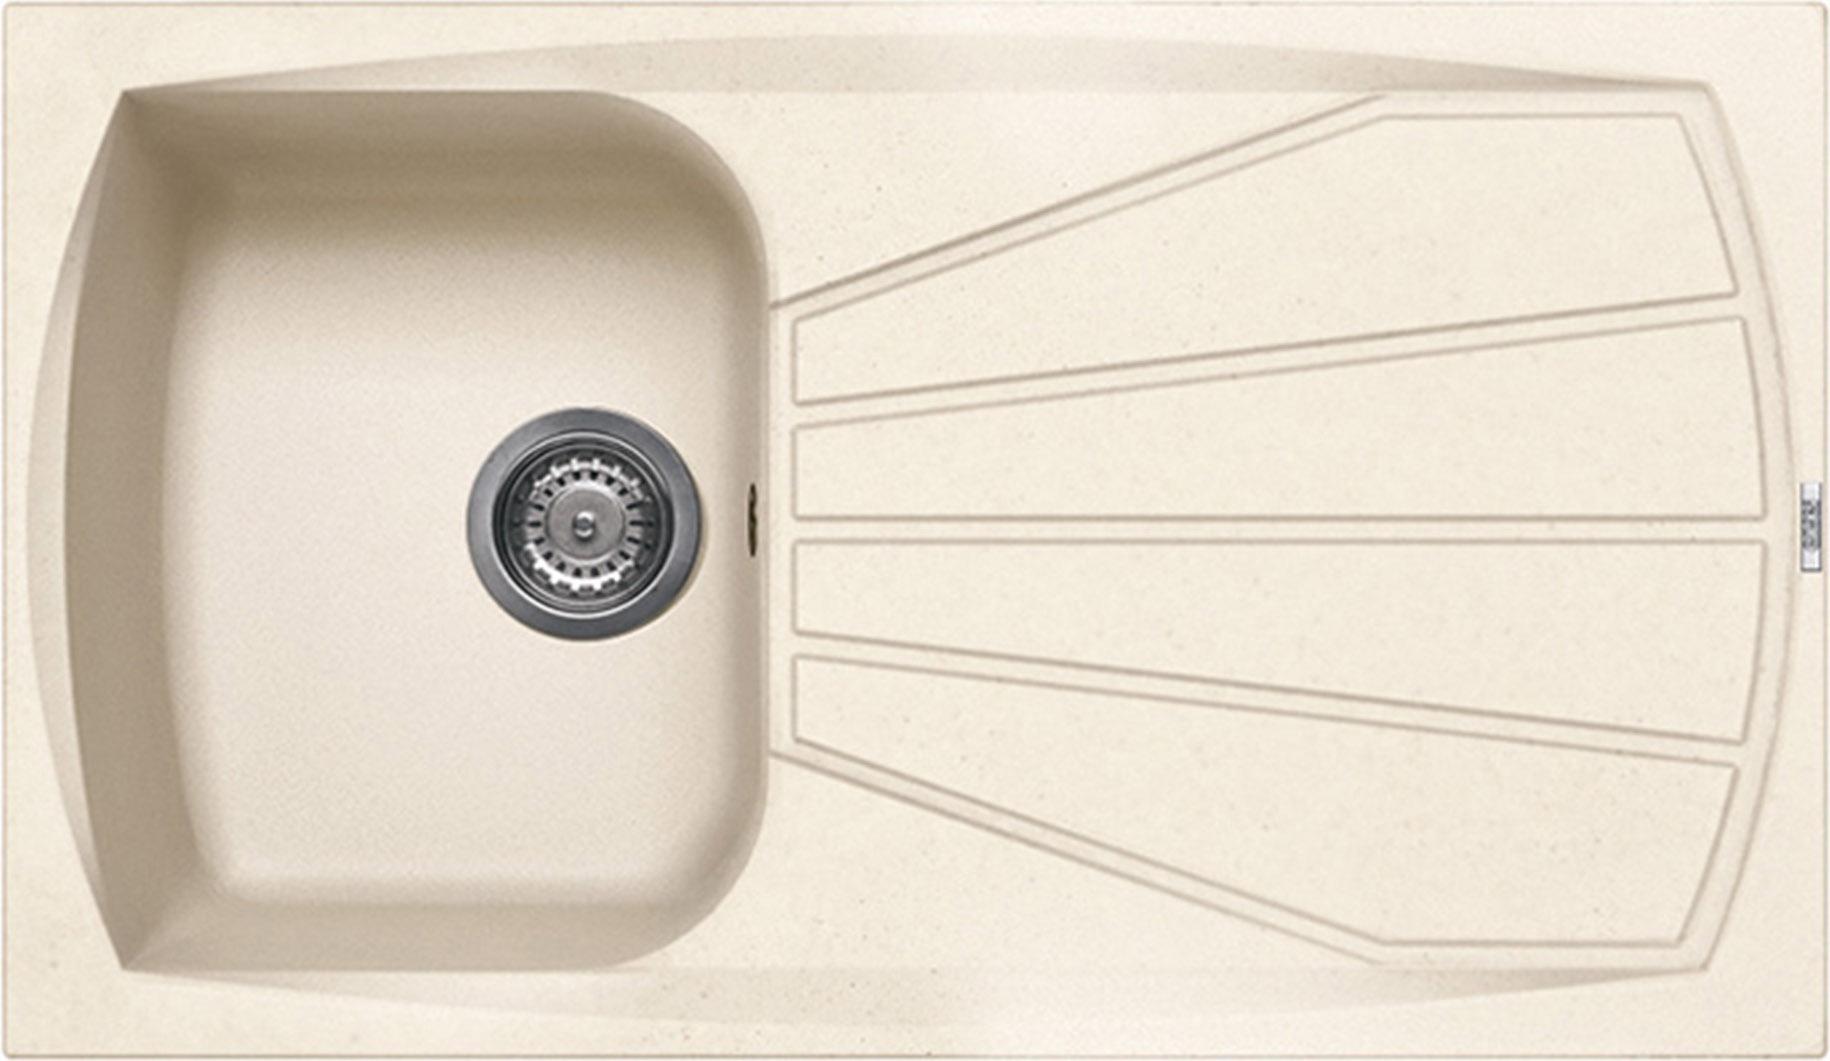 Lavello Ceramica Una Vasca | Lavello Inox 80 D Una Vasca Per ...